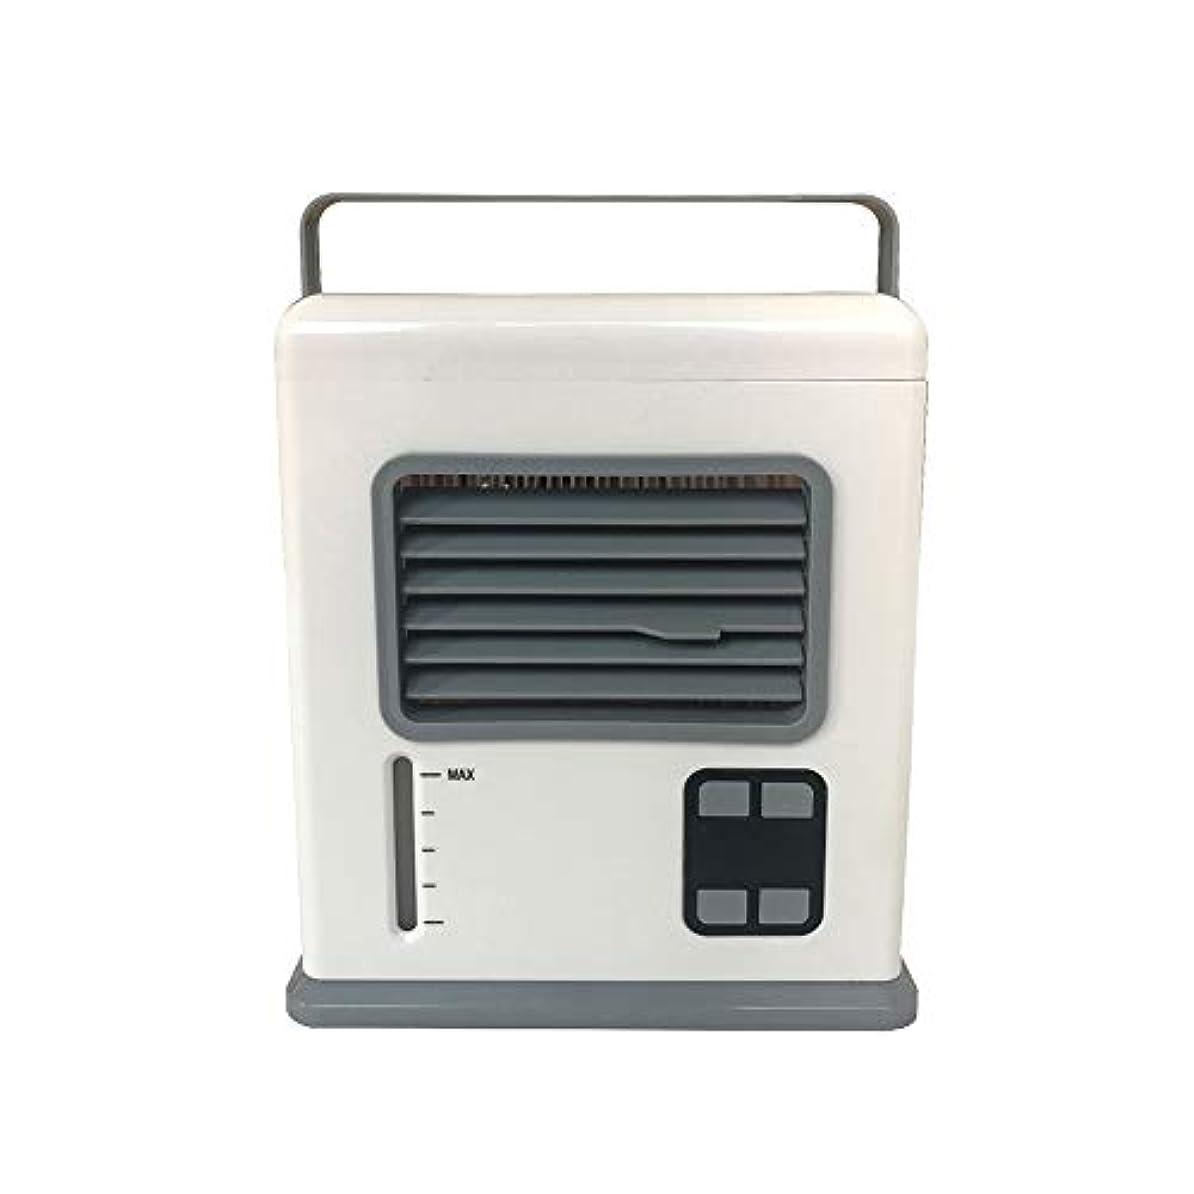 Galapara冷風機 ミニエアコンファン オフィスの家の睡眠のためのデジタル表示装置の小型空気クーラーUSBの/電池式の静かな空冷ファンの送風機